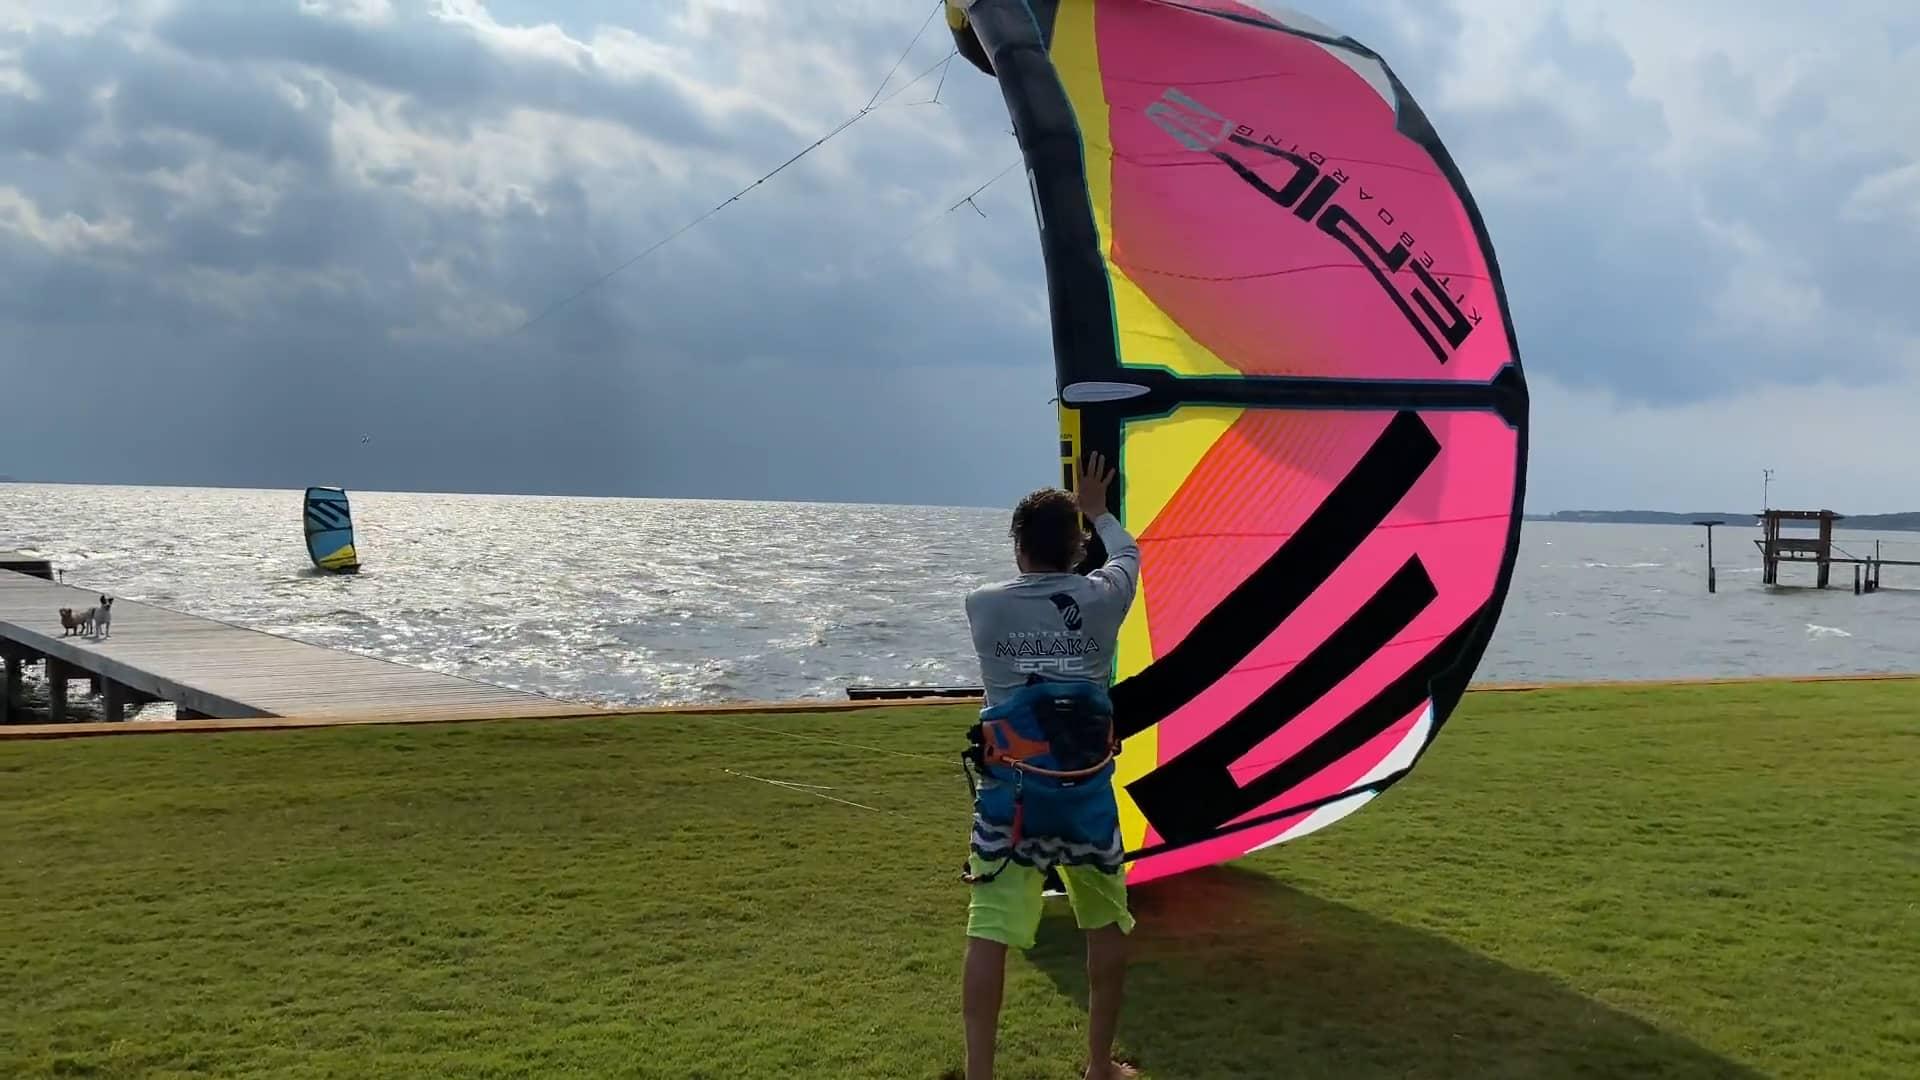 Crazy man launching a kite - with Epic Kites Kiteboarding